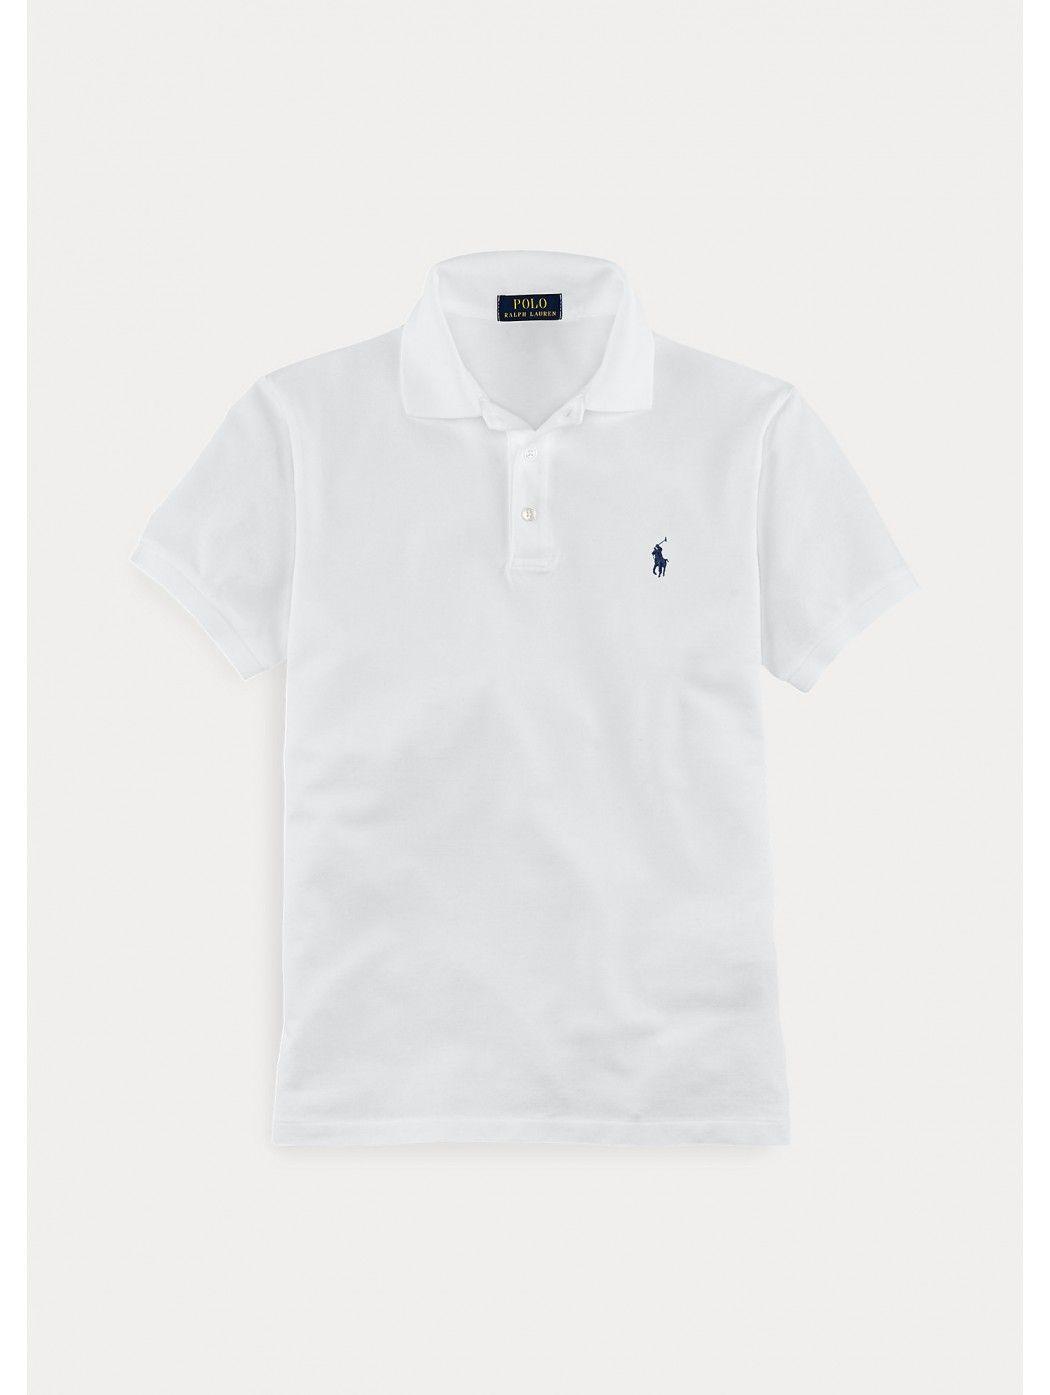 Polo in piqu' stretch Slim-Fit POLO RALPH LAUREN UOMO 710541705 008